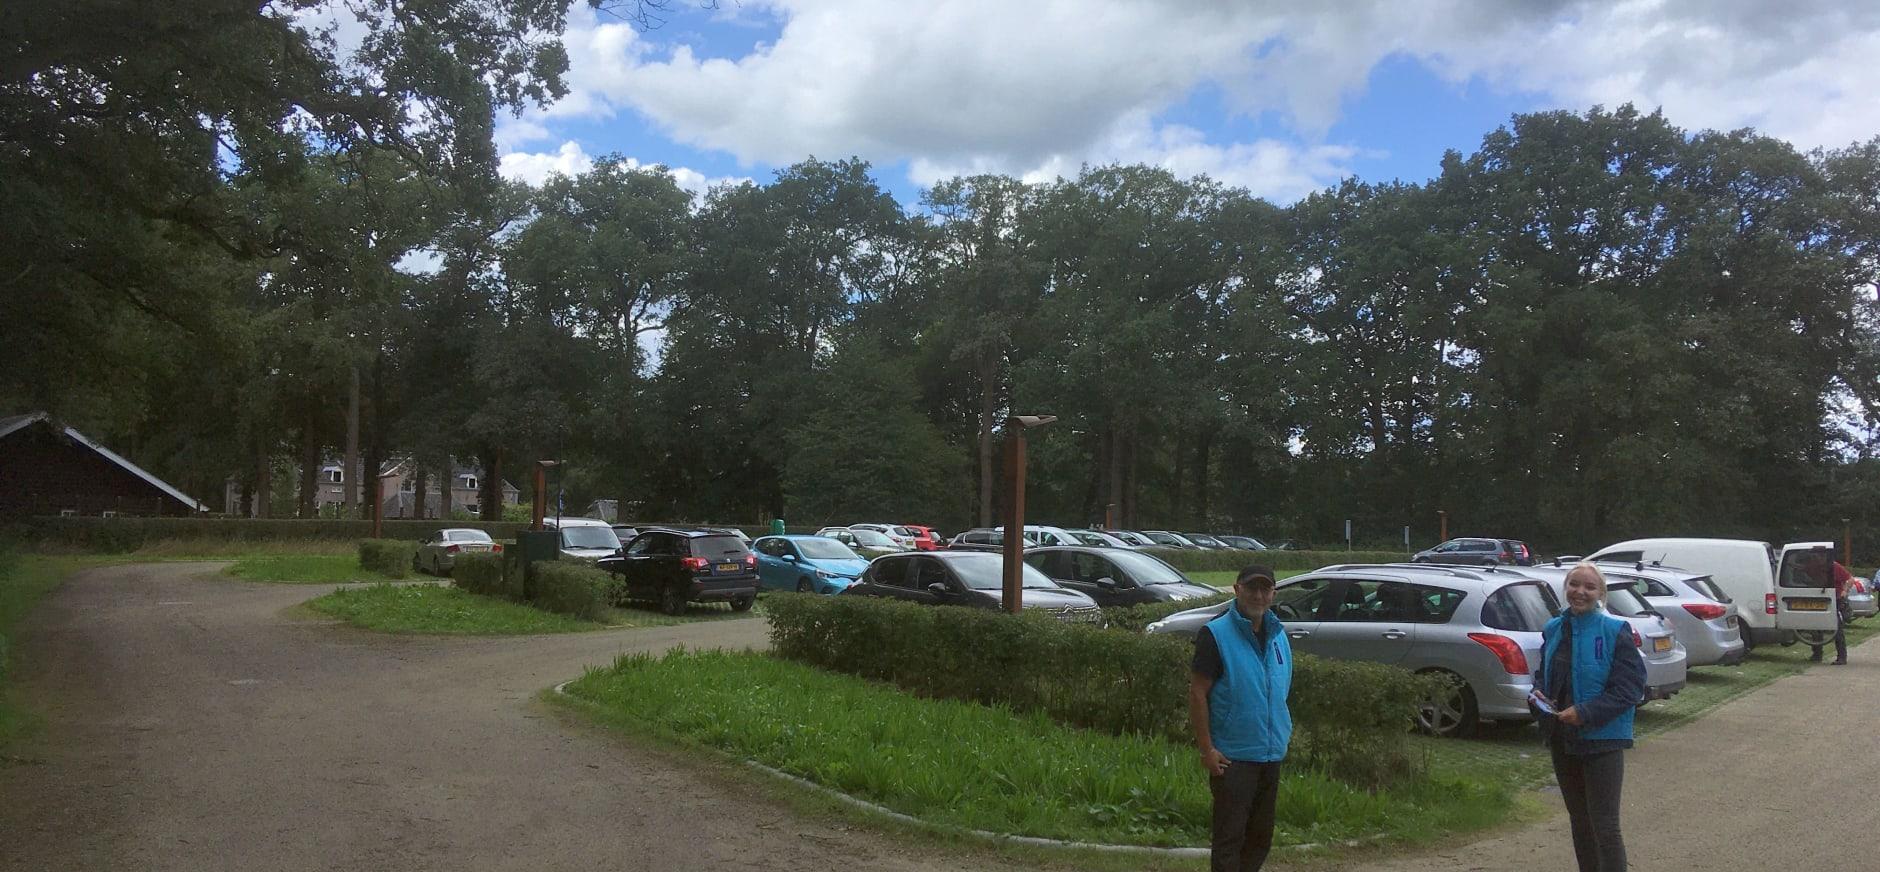 Leden parkeren gratis